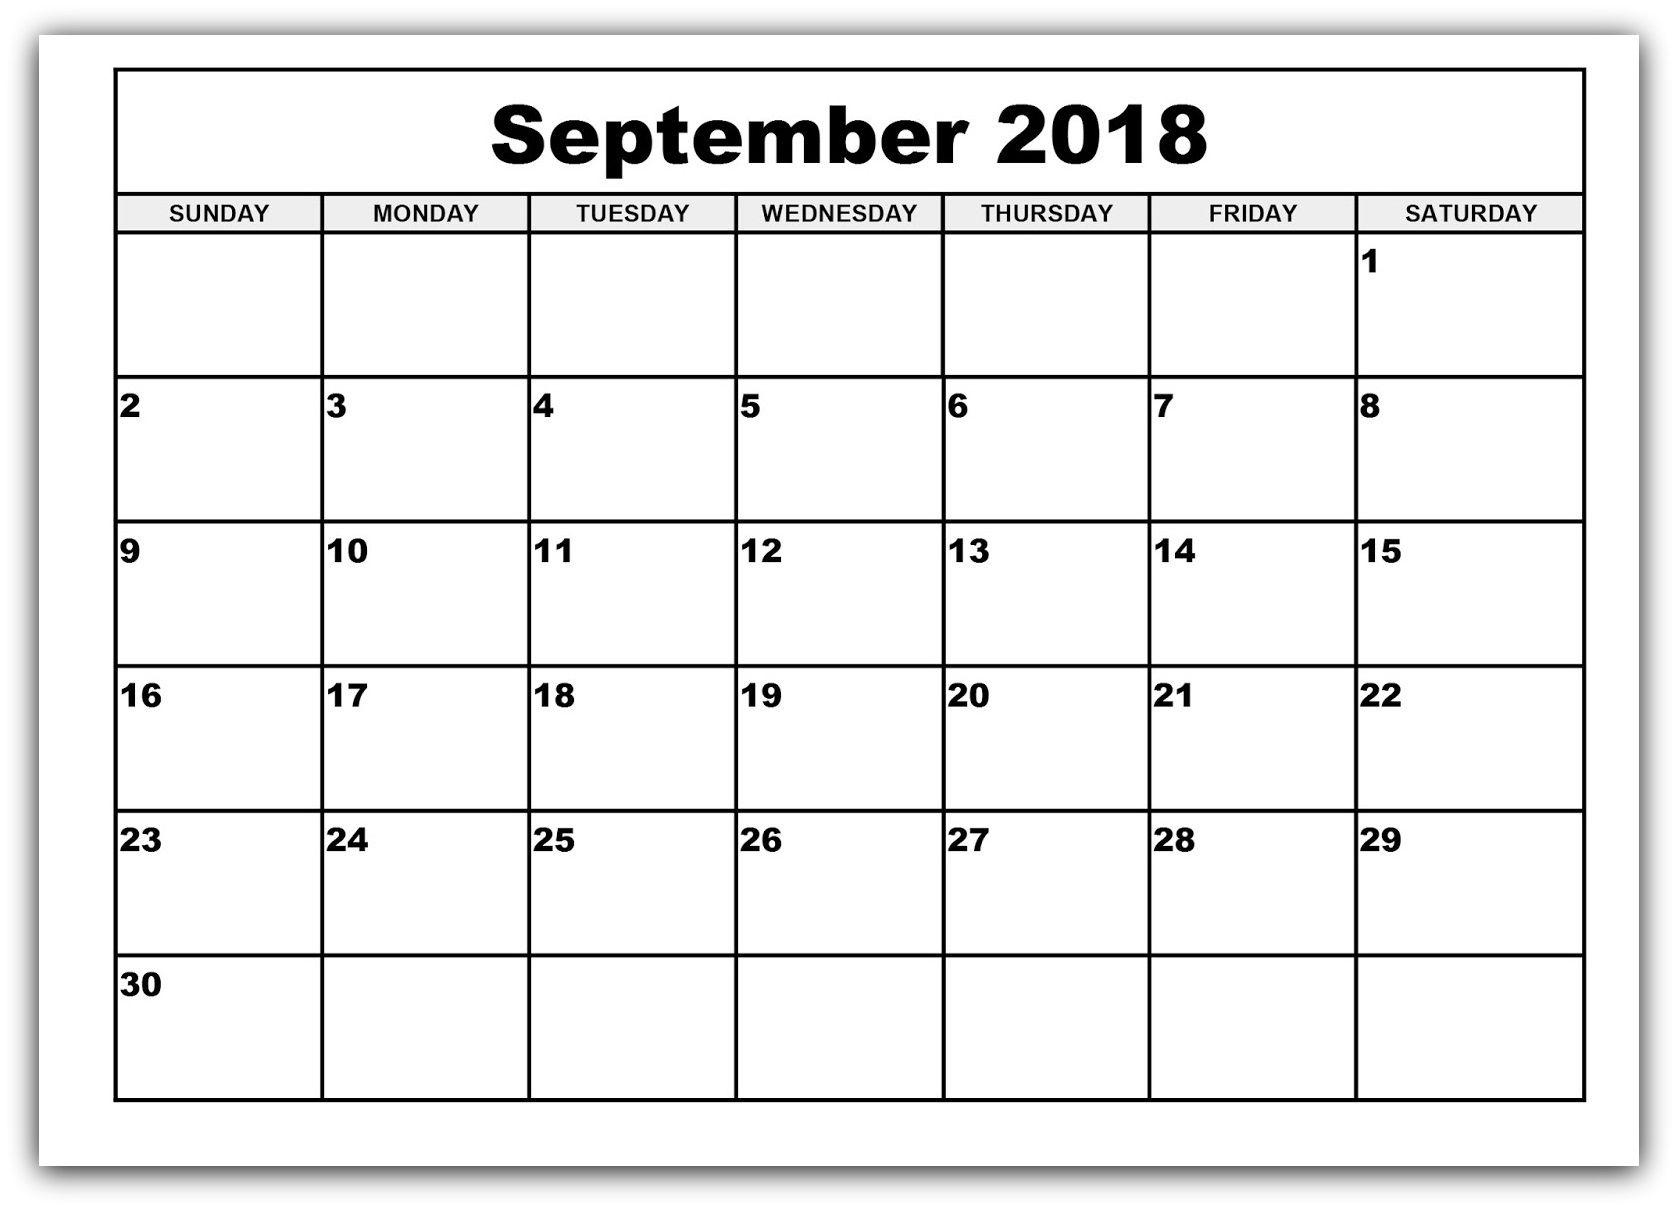 September 2018 Calendar Free Printable Bold Style | Calendar